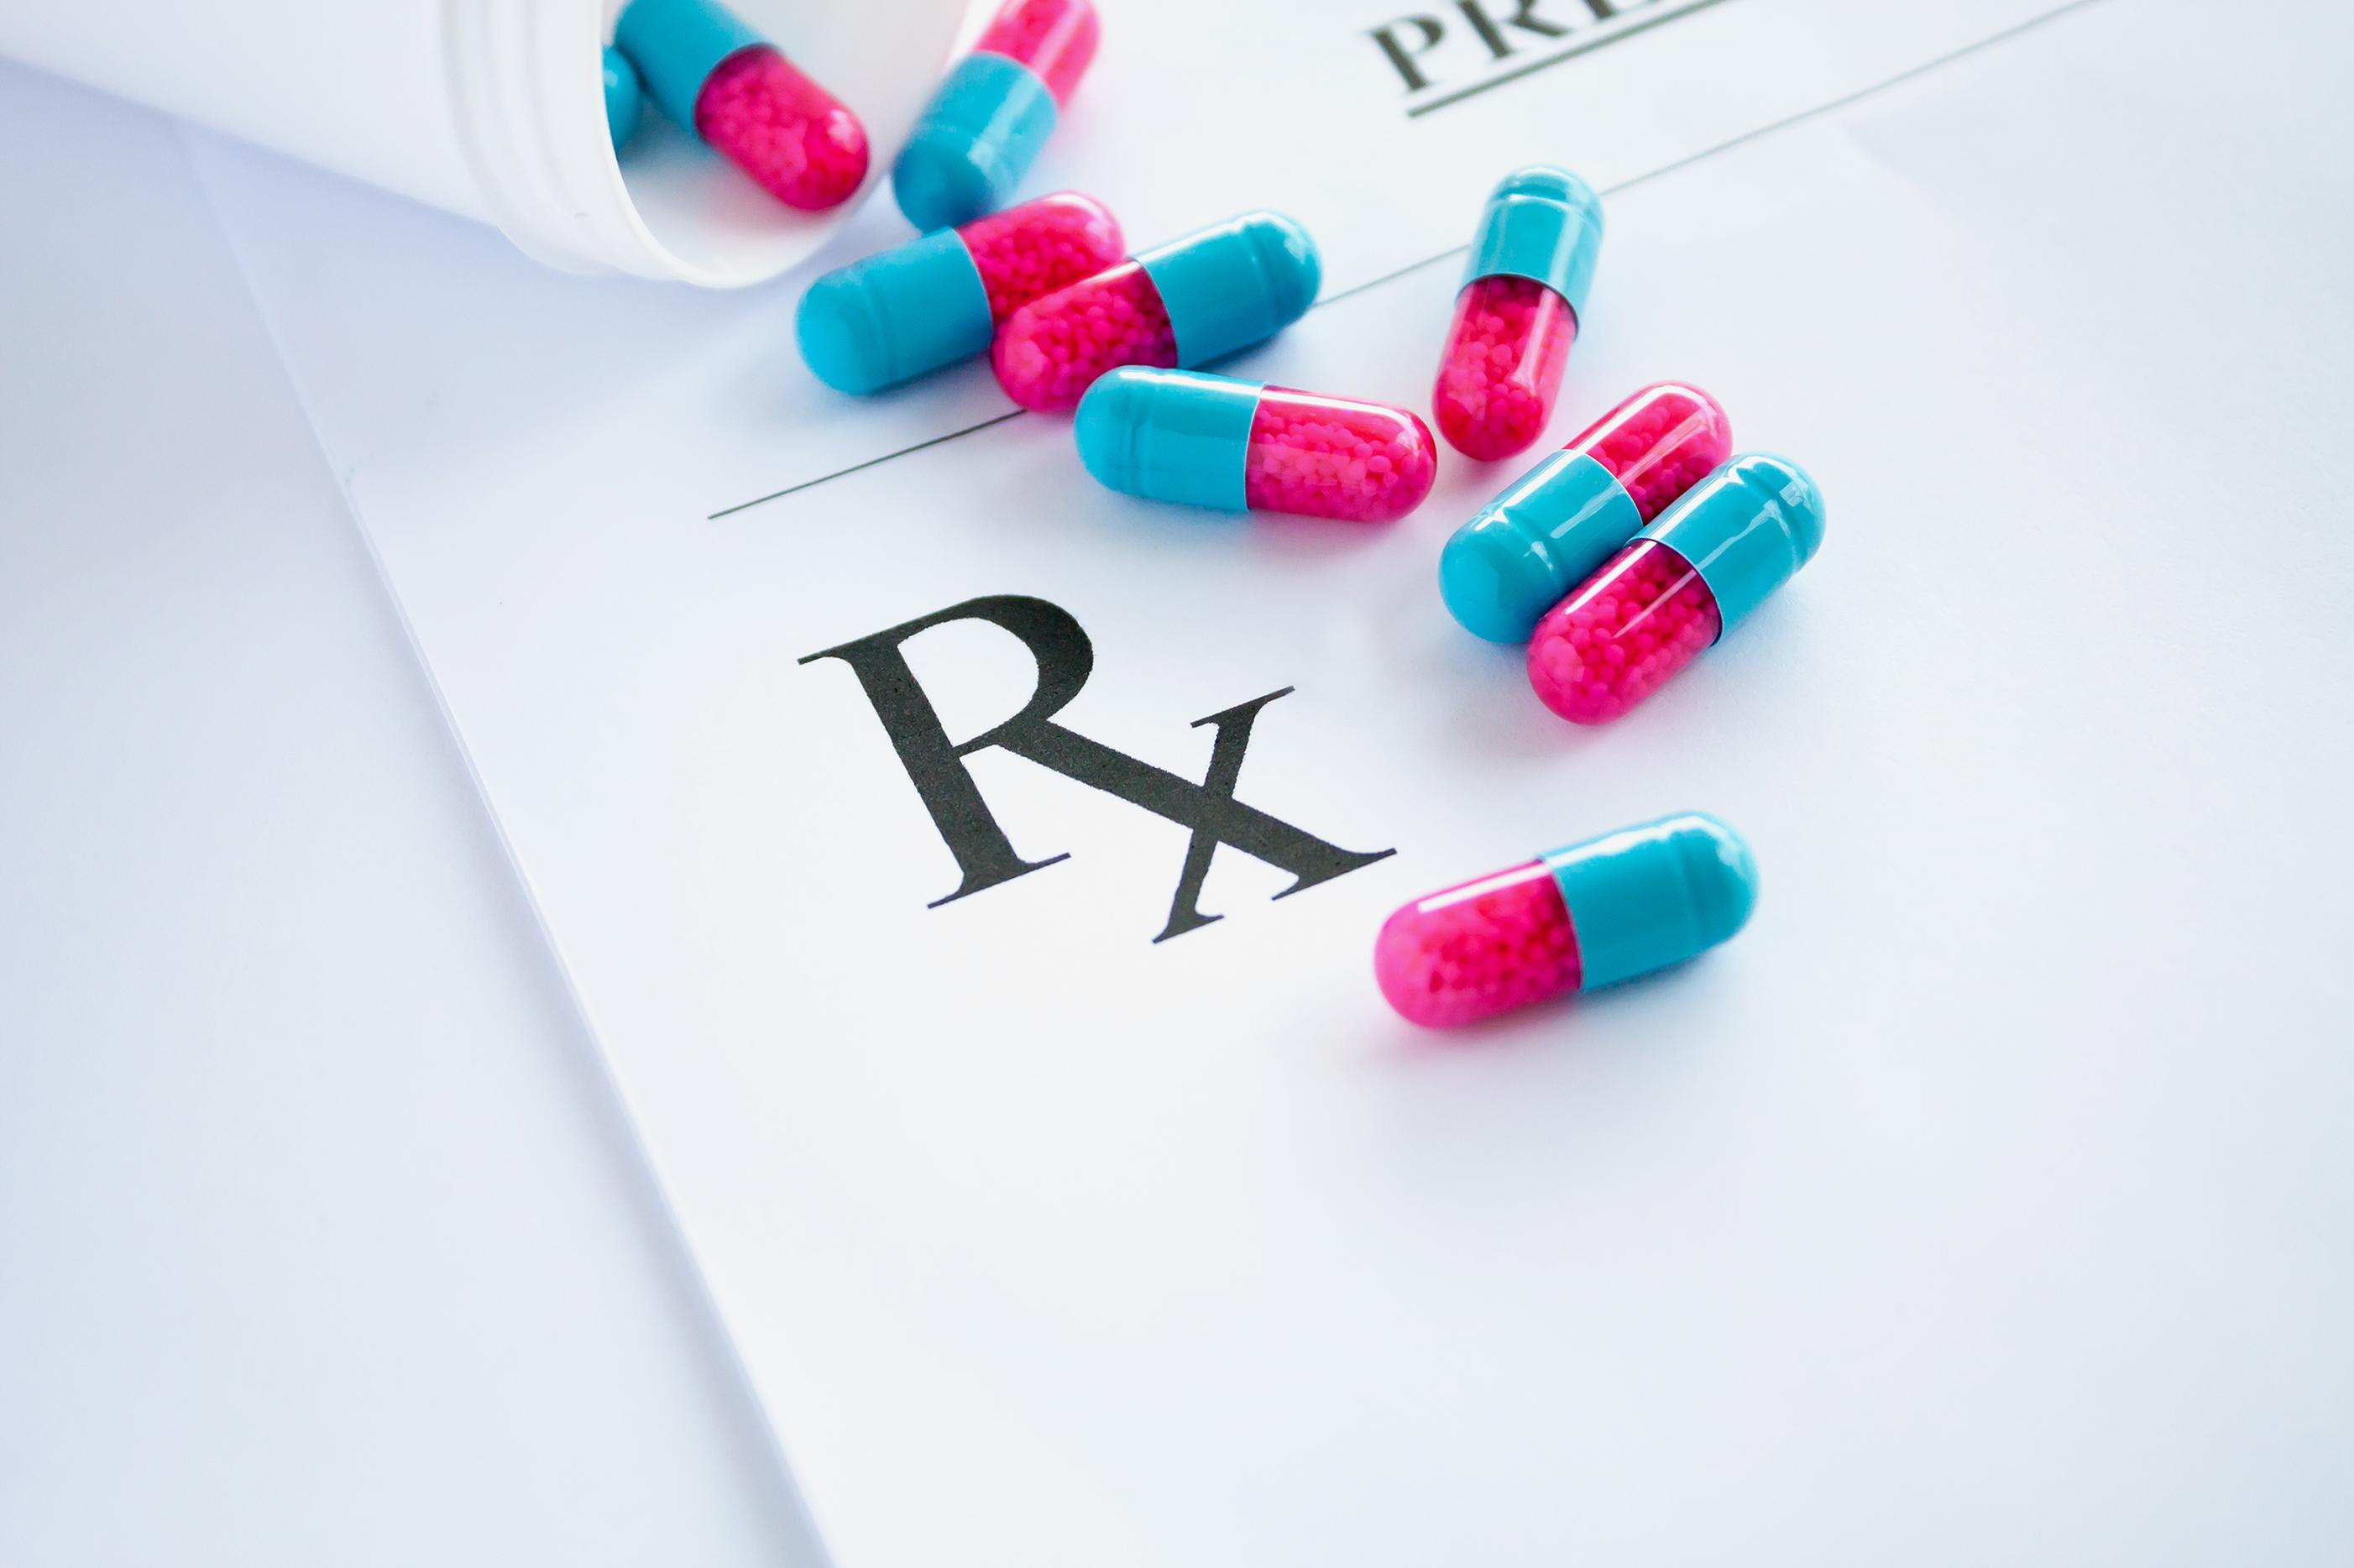 Pills with a Prescription